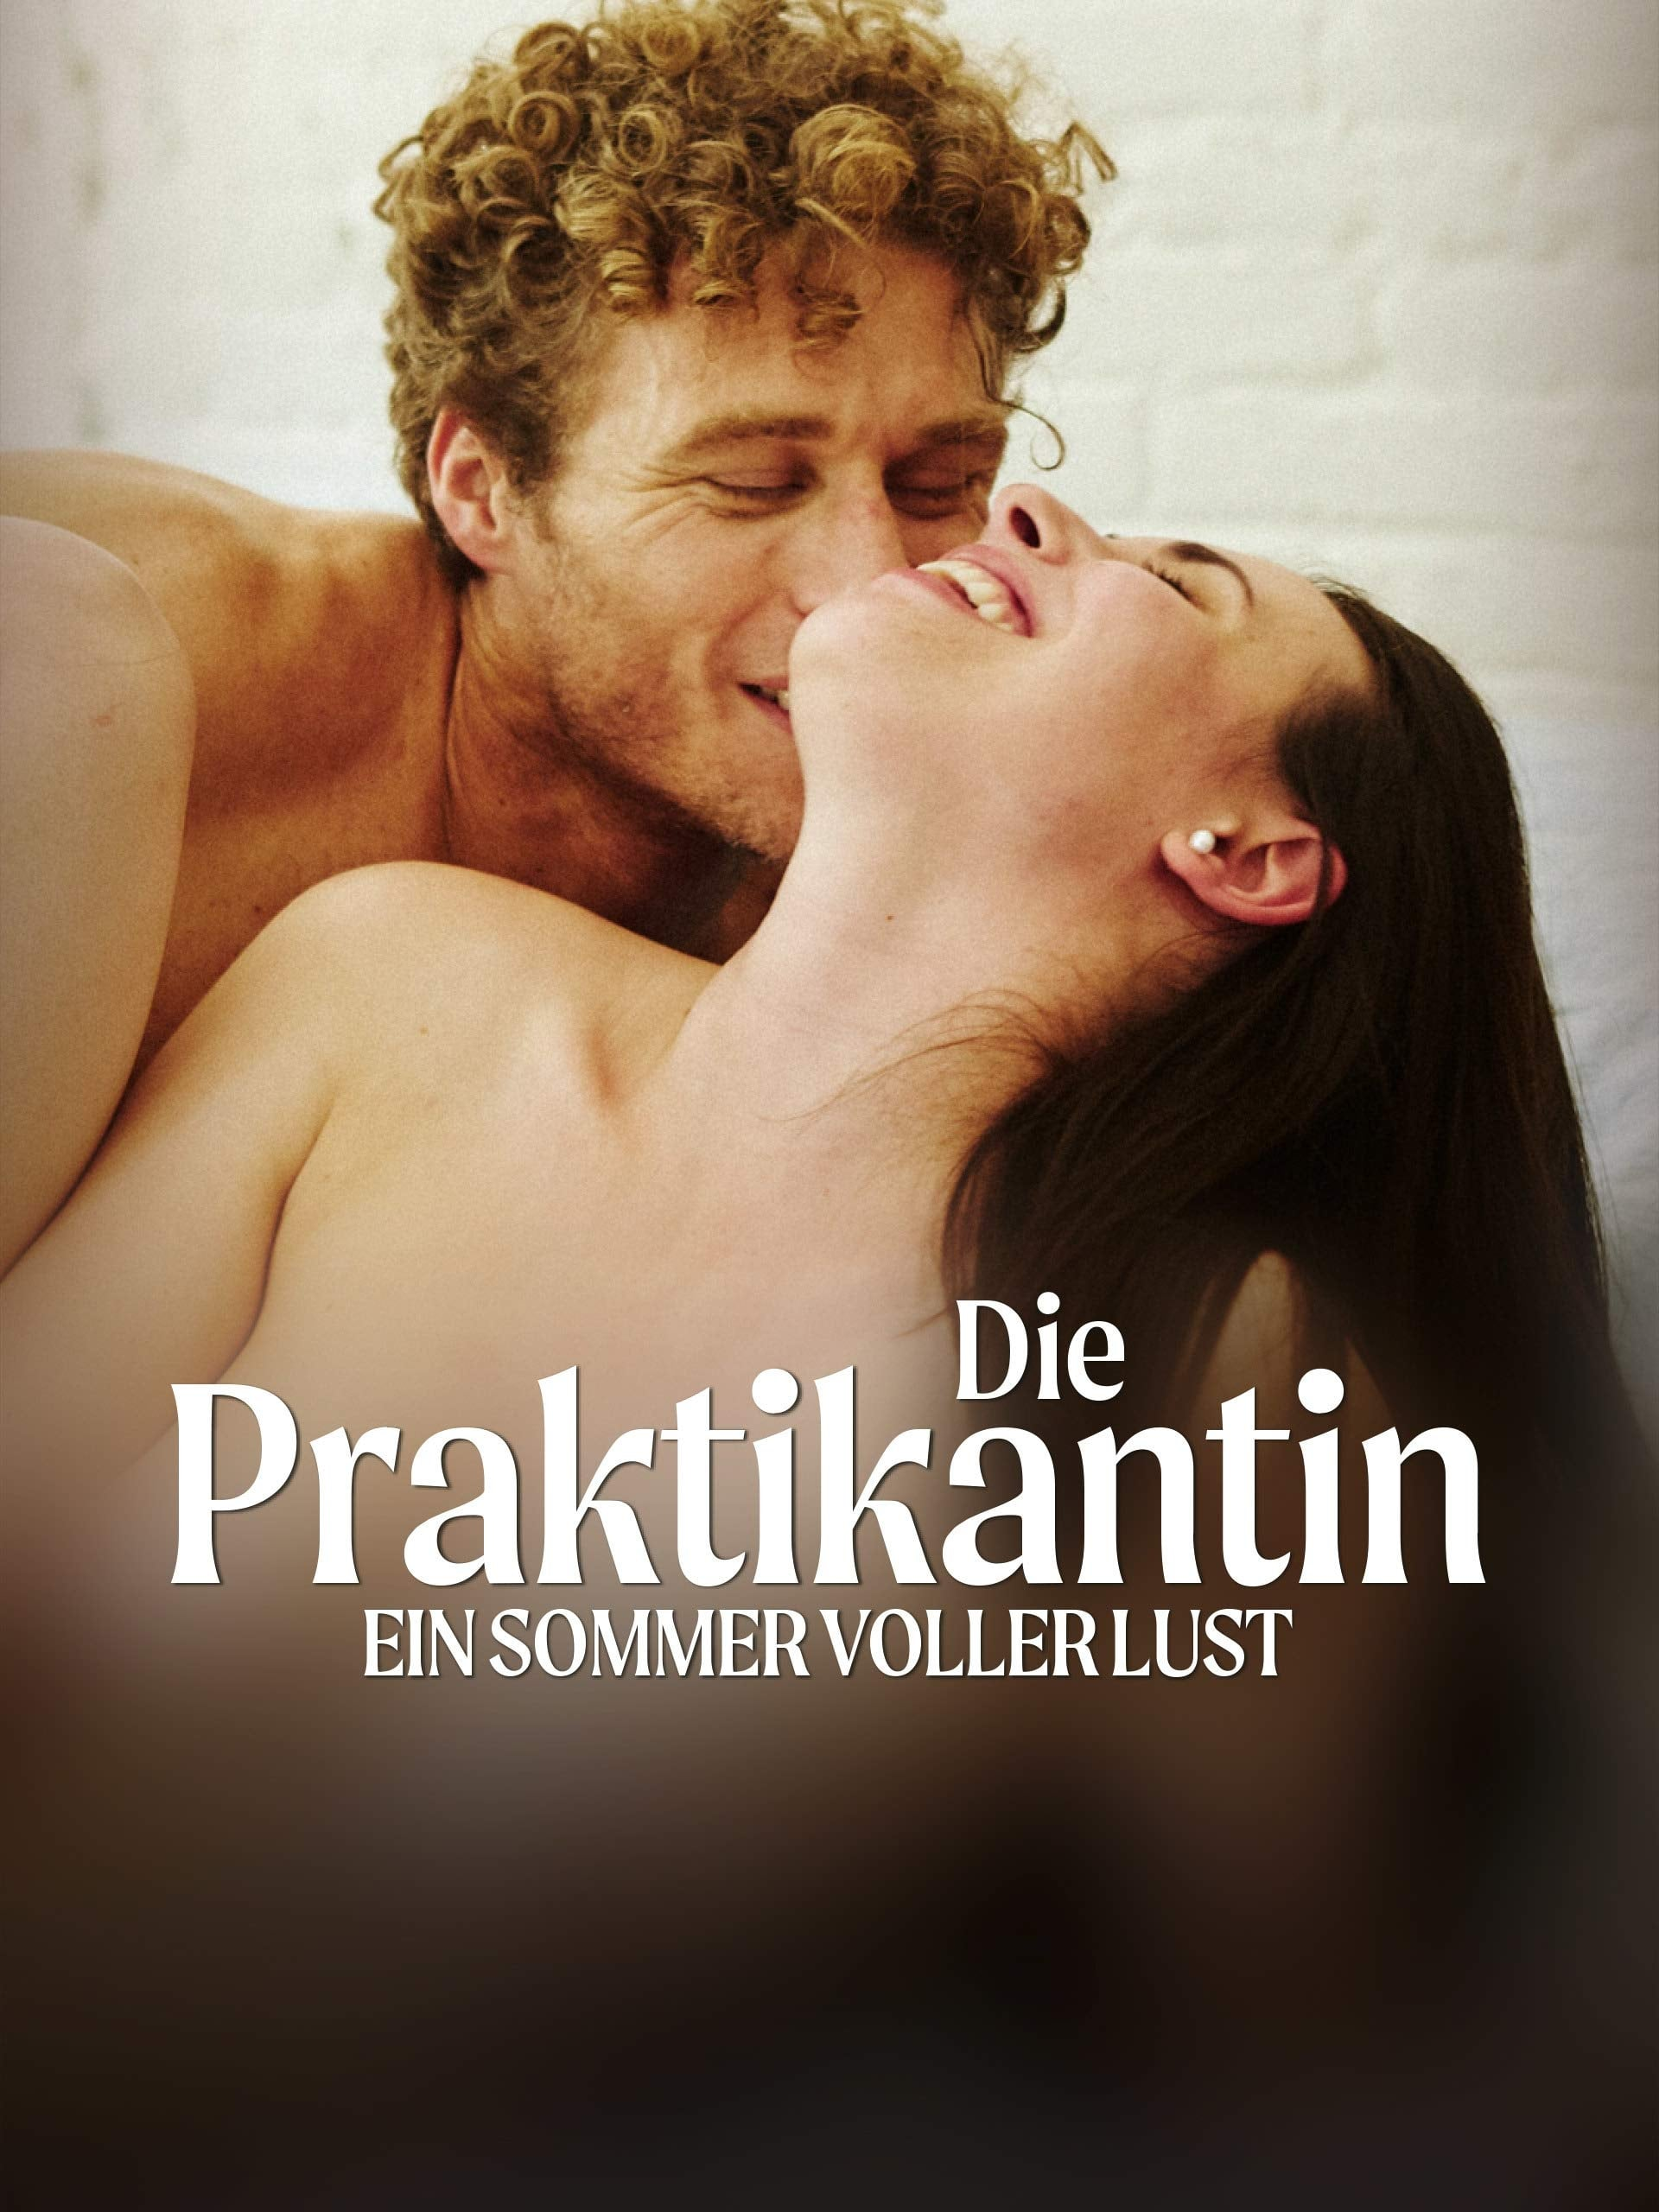 Watch Movie The Intern - A Summer of Lust